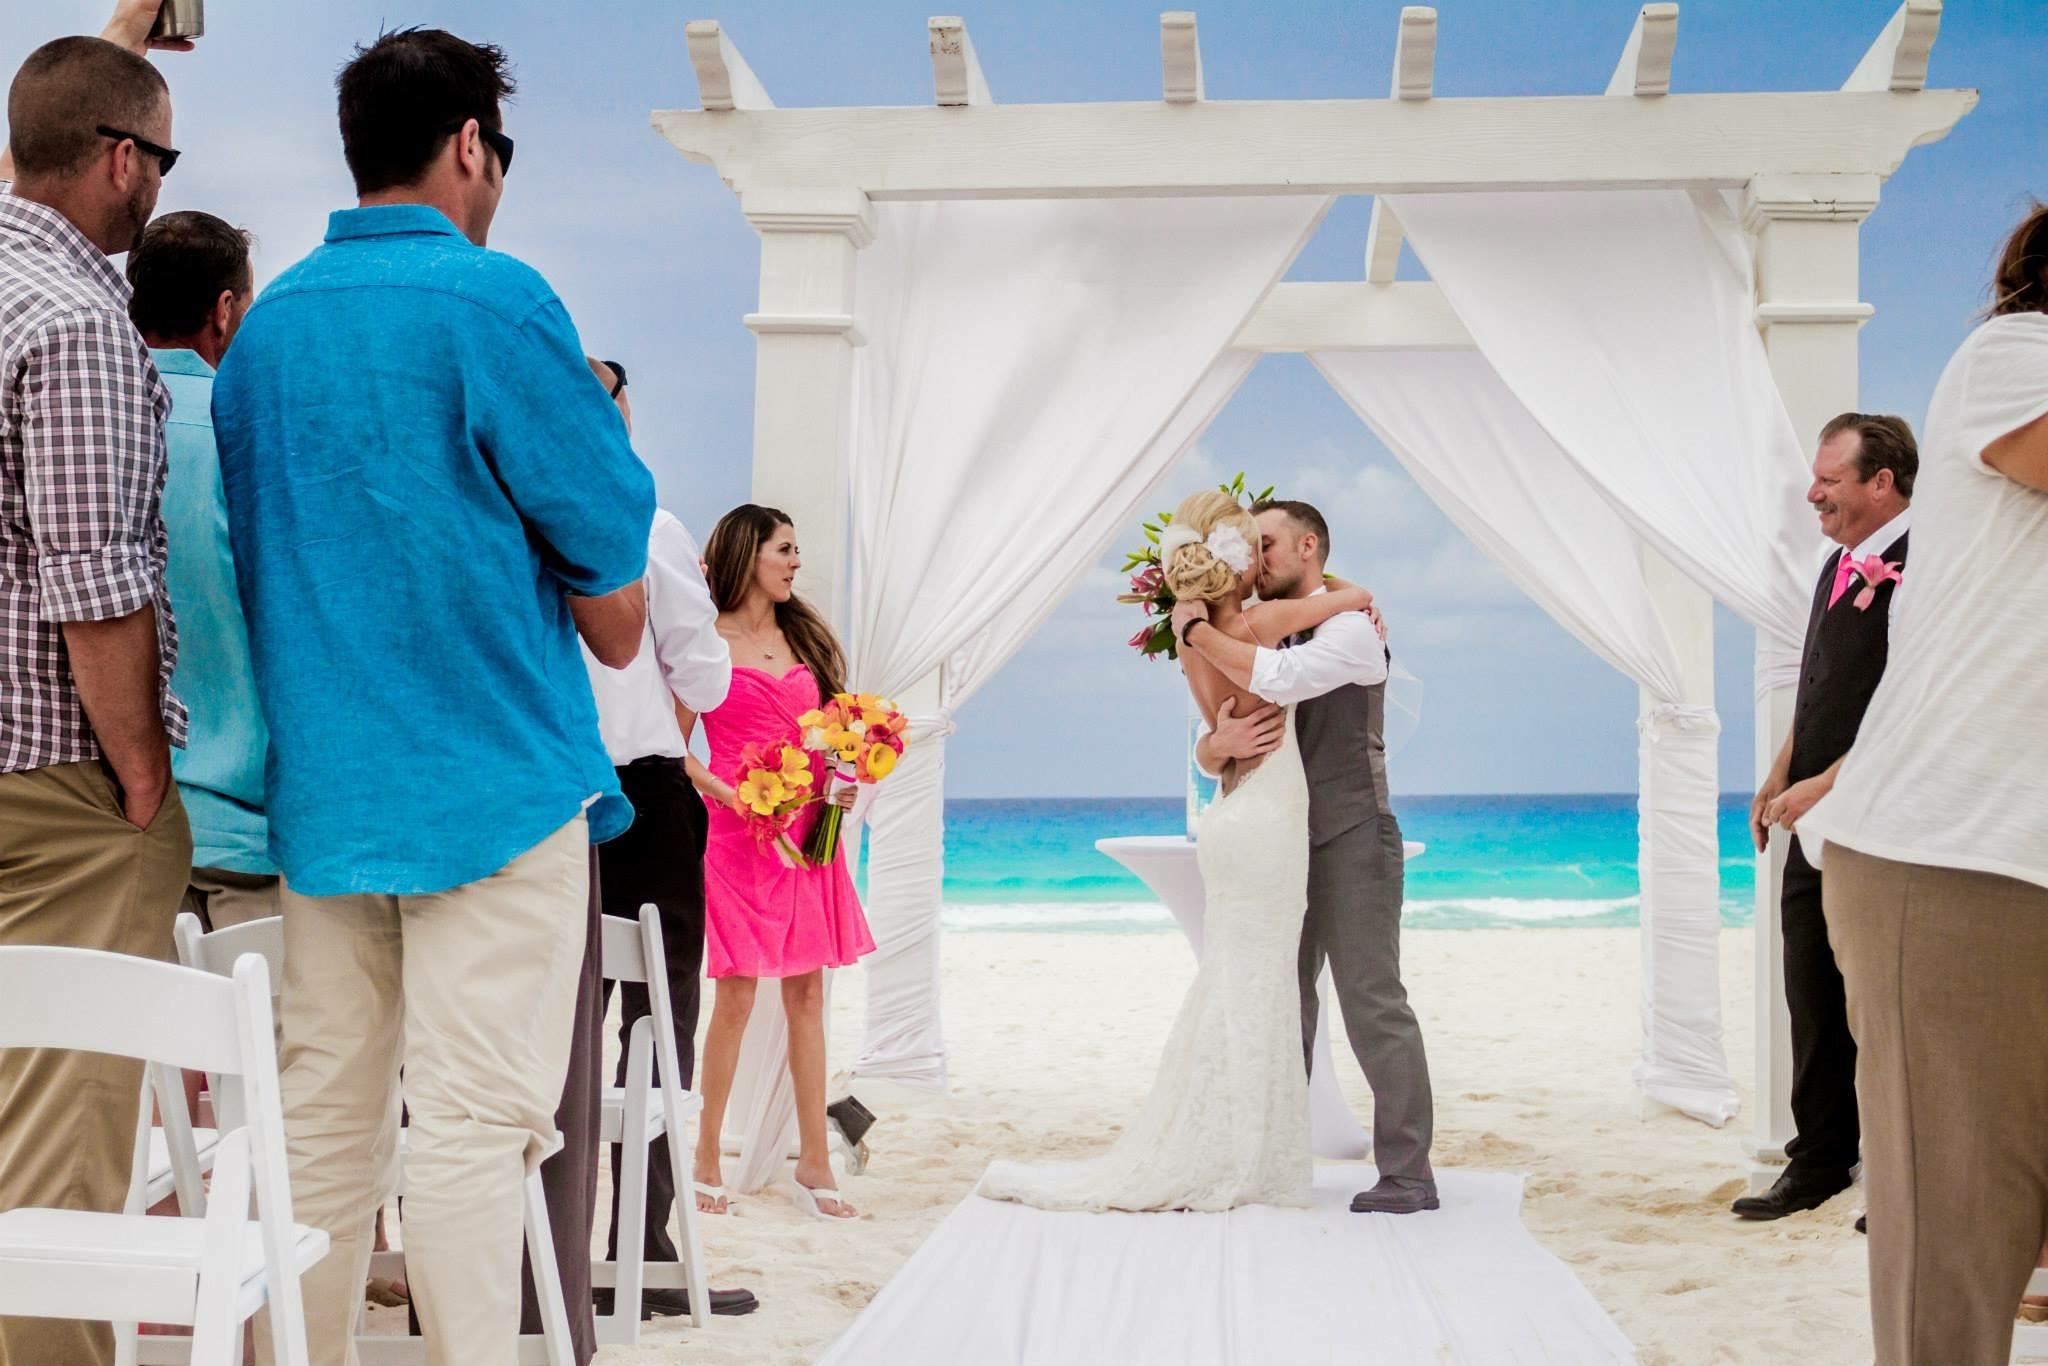 krysten-reed-cancun-beach-wedding-11.JPG